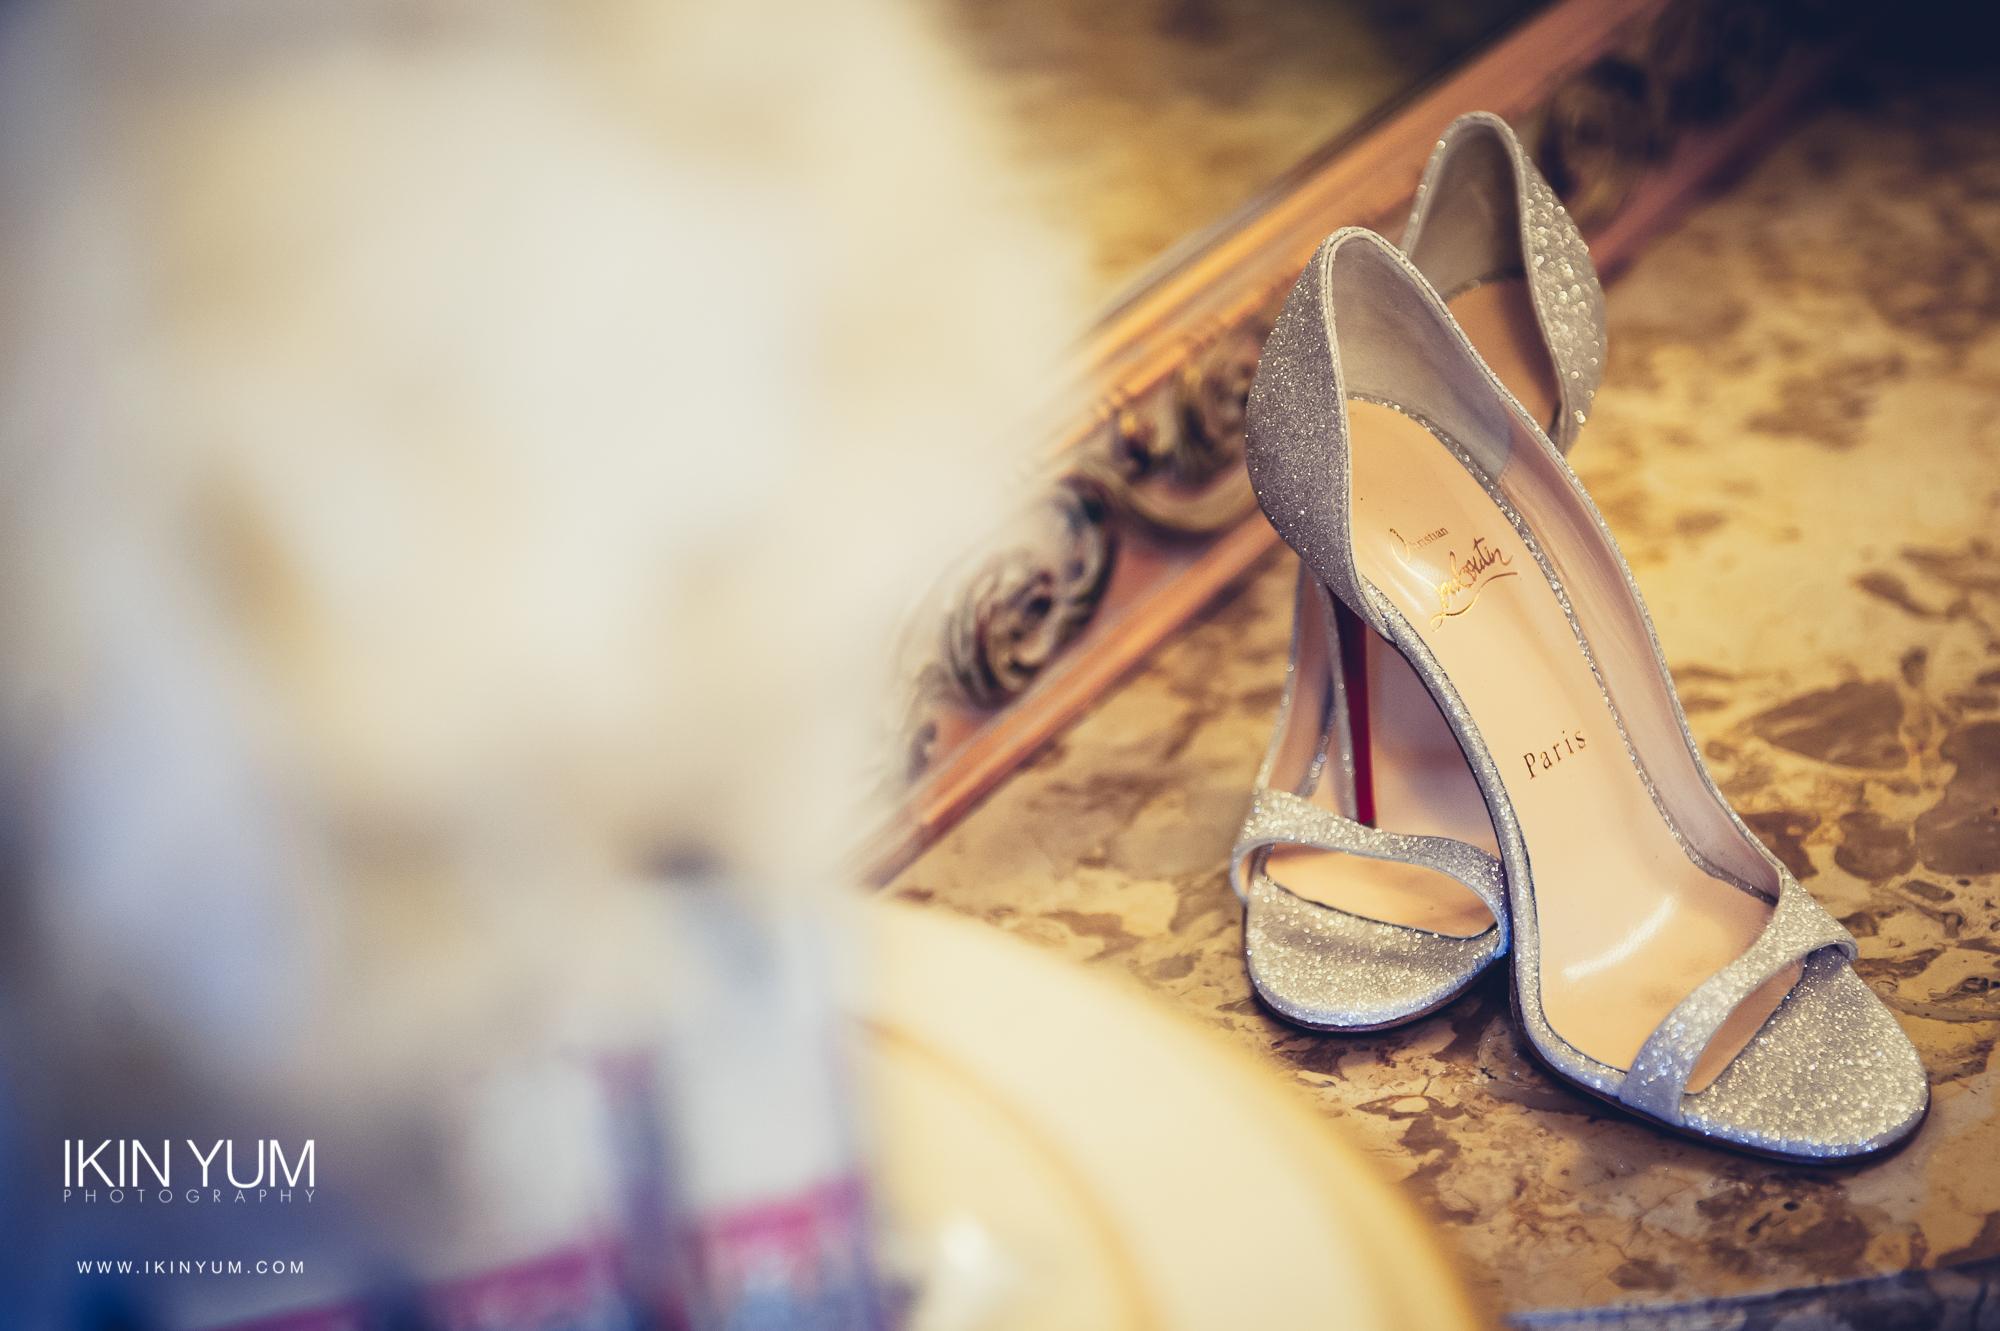 Holland Park Wedding - Ikin Yum Photography-0001.jpg